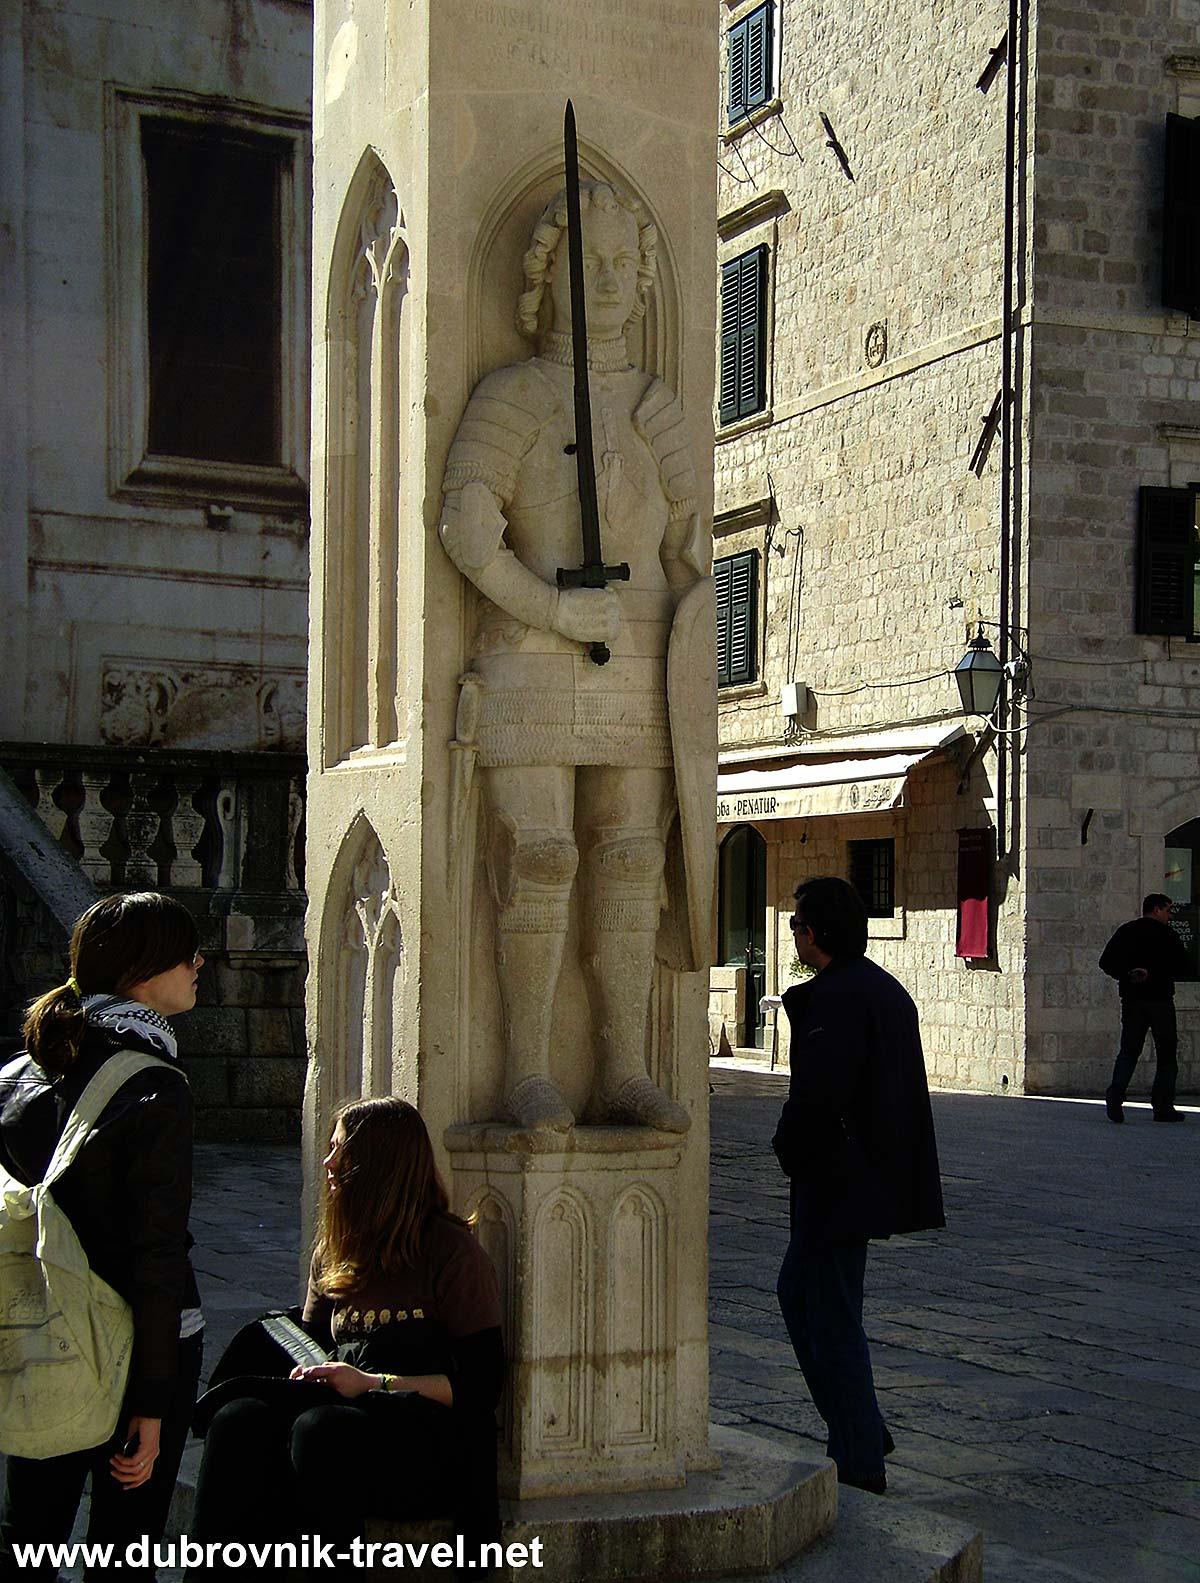 Orlando's Column - a popular place to rest - Dubrovnik